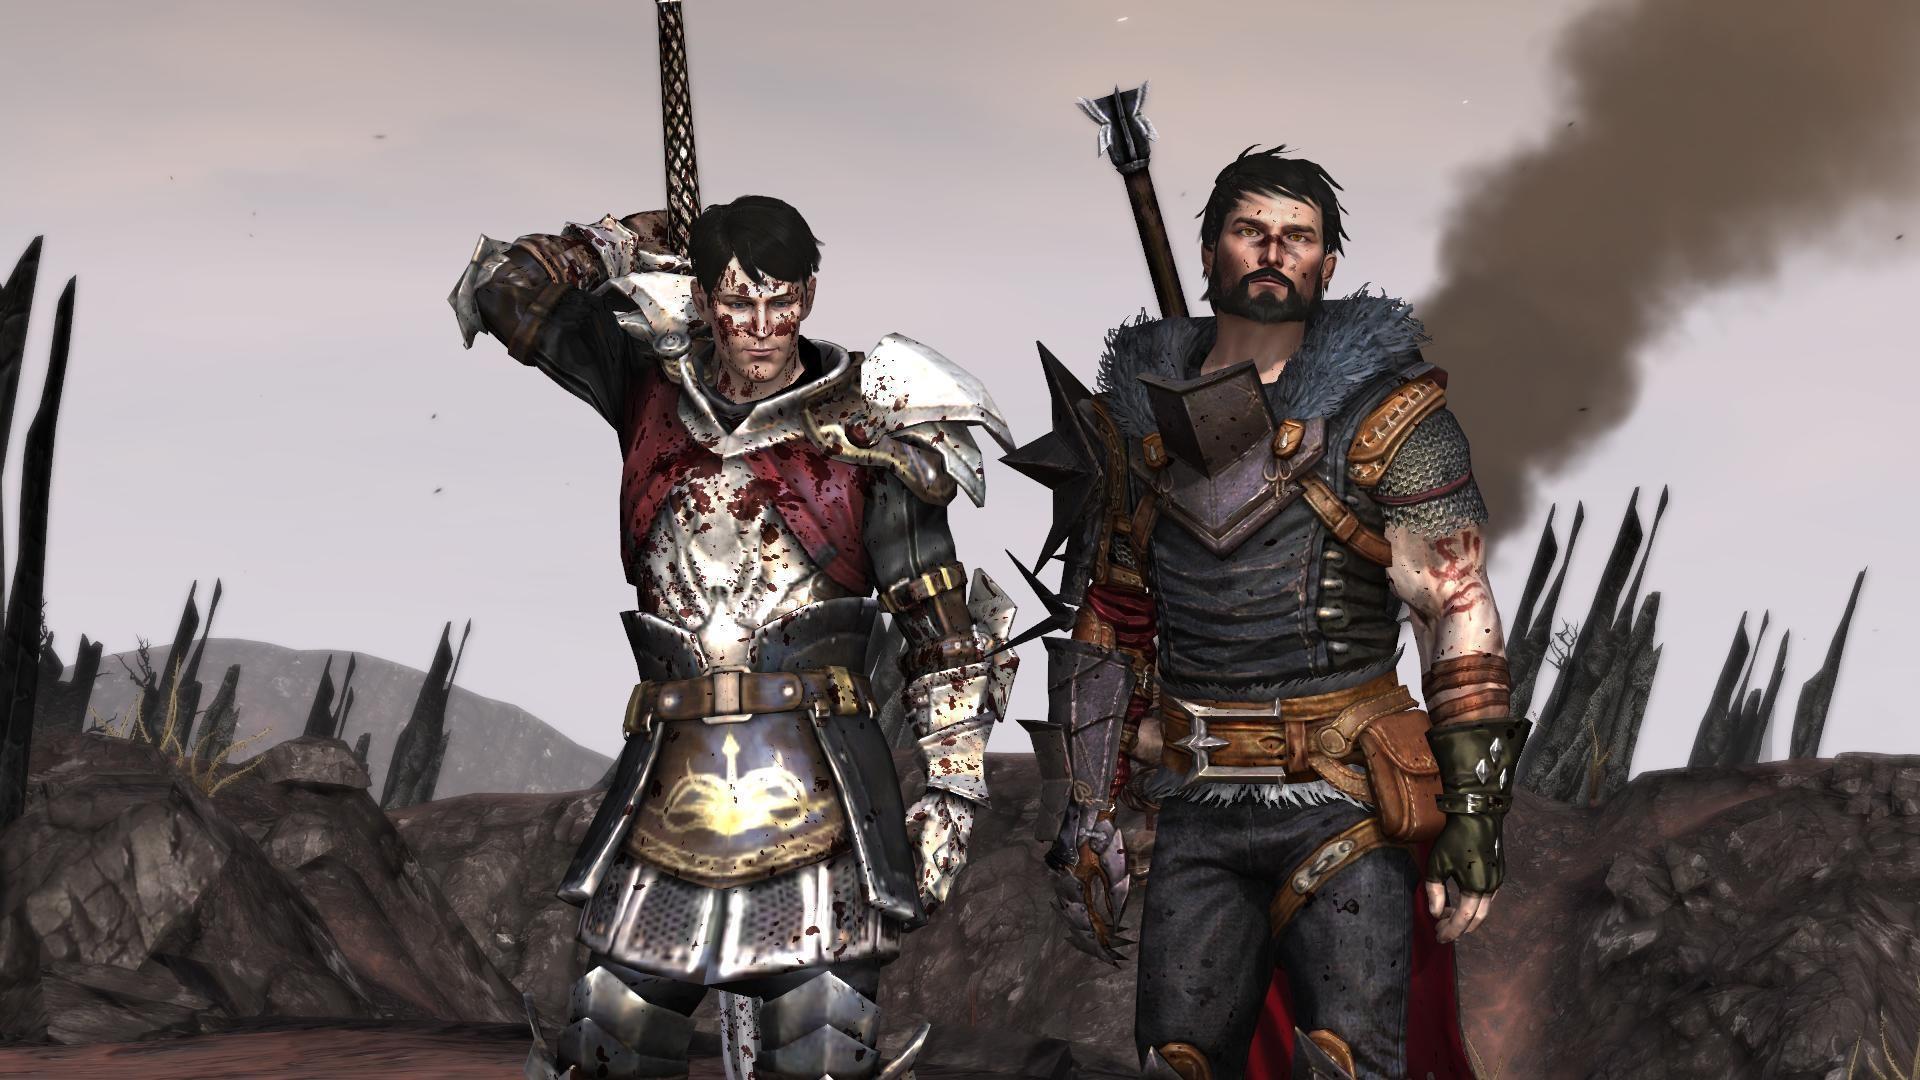 Dragon Age Origins Wallpaper Hd 81 Pictures